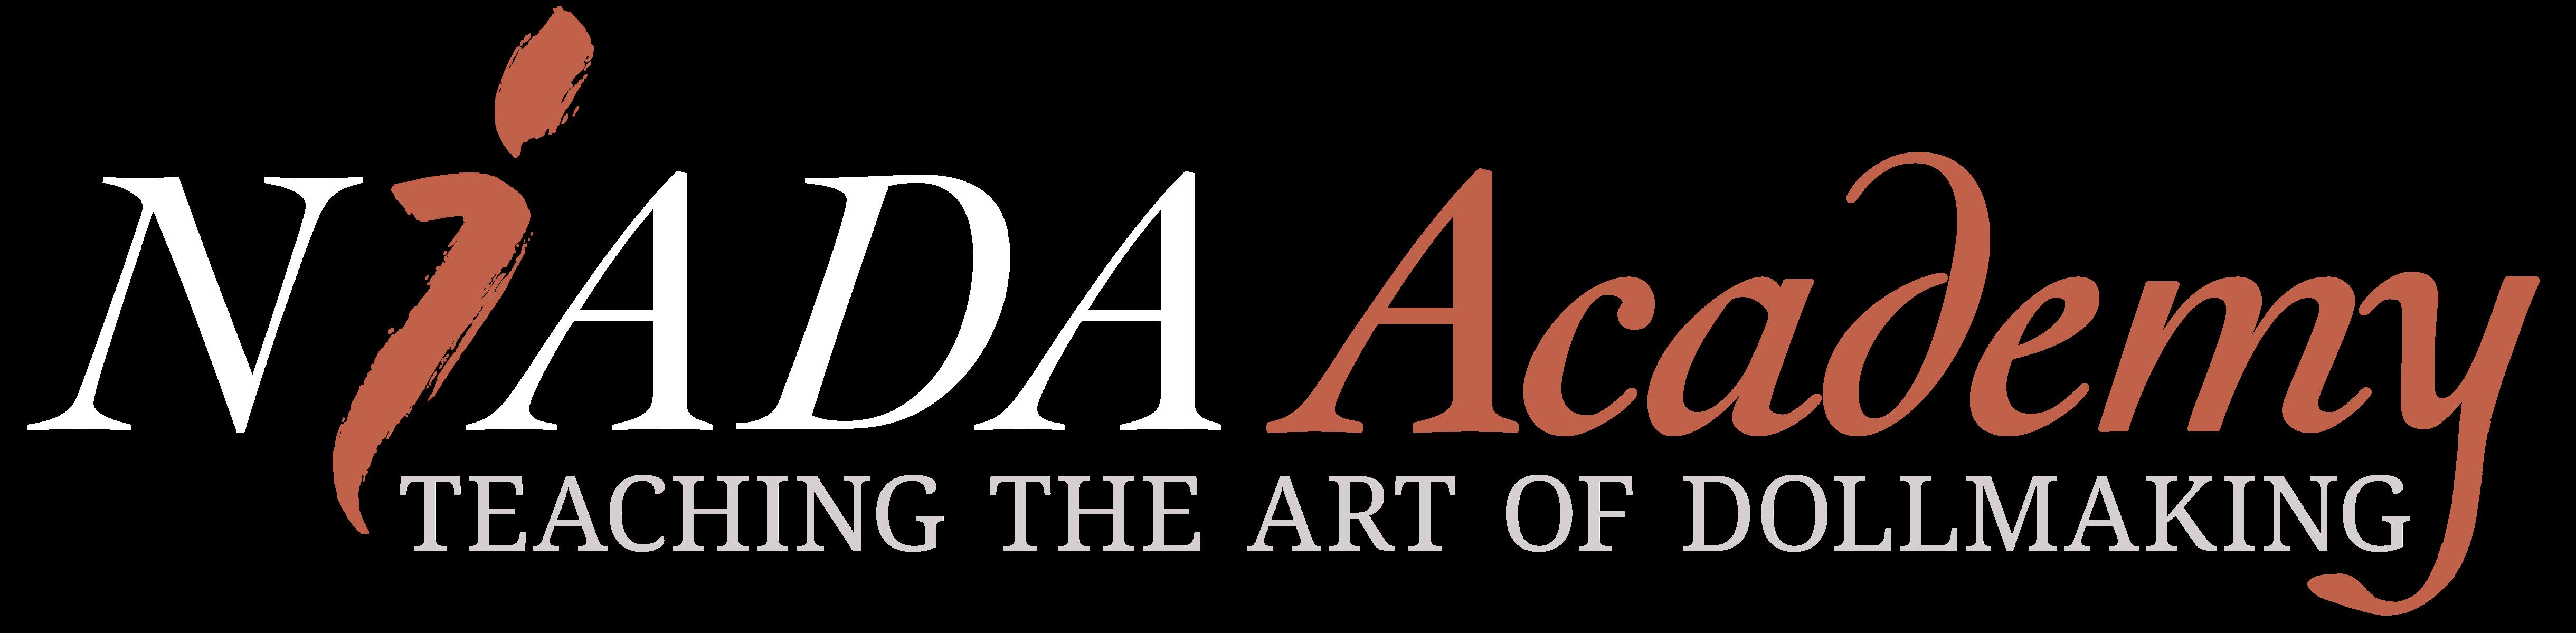 niada-academy